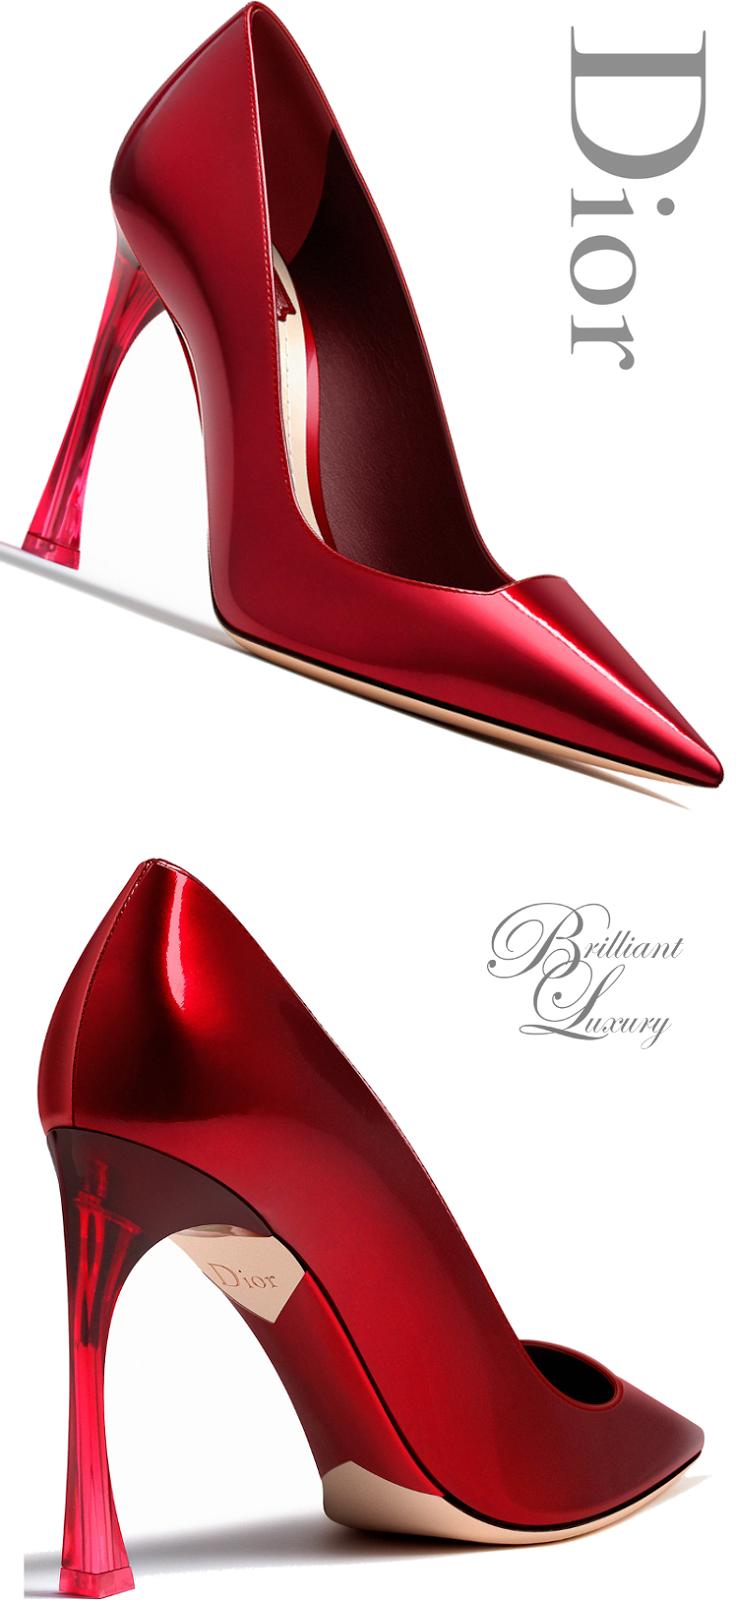 Brilliant Luxury Heels Red High Heels High Heels Images